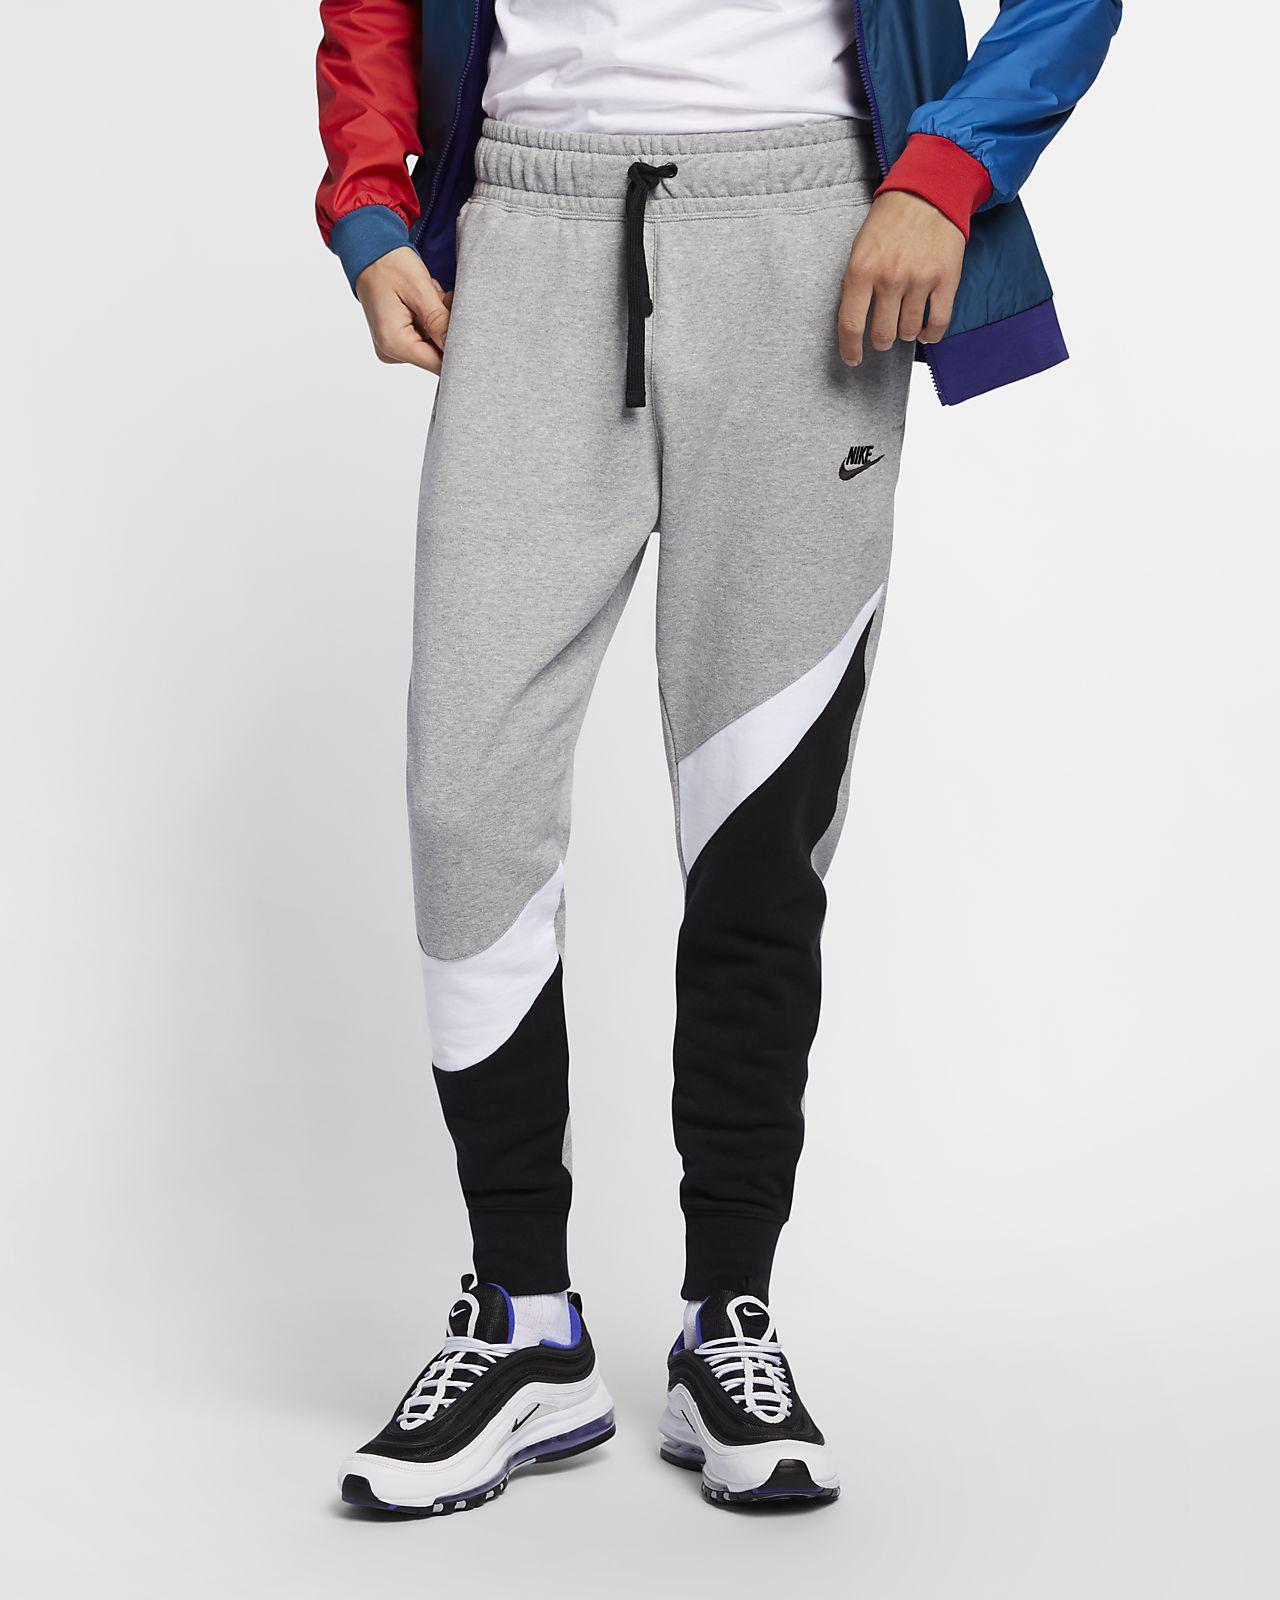 Брюки из ткани френч терри Nike Sportswear